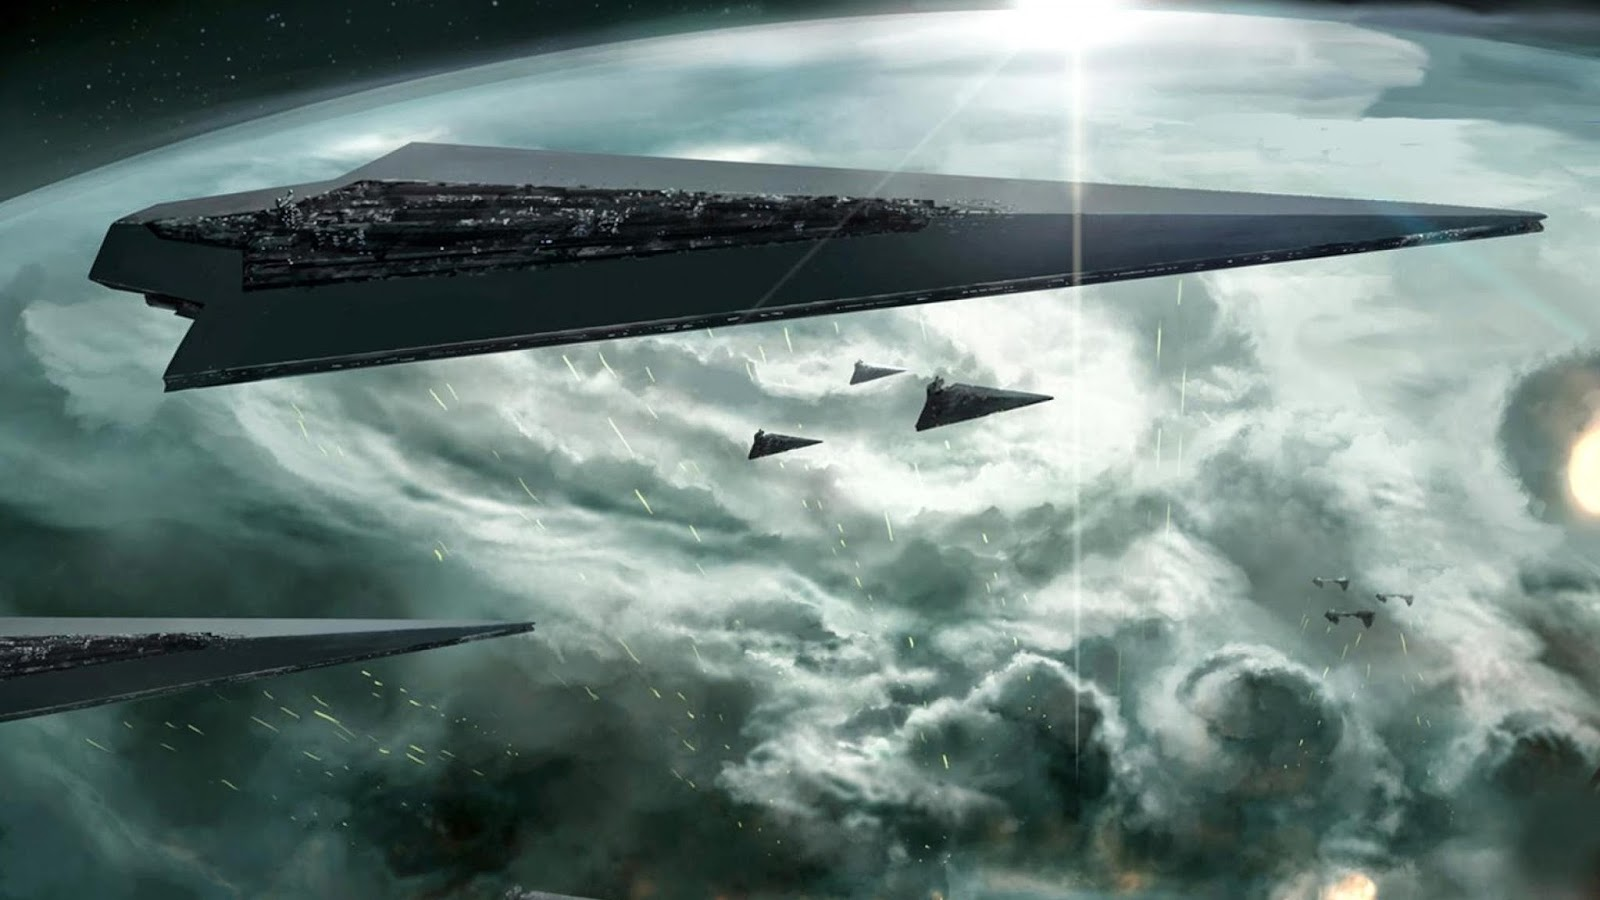 Command ship in orbit